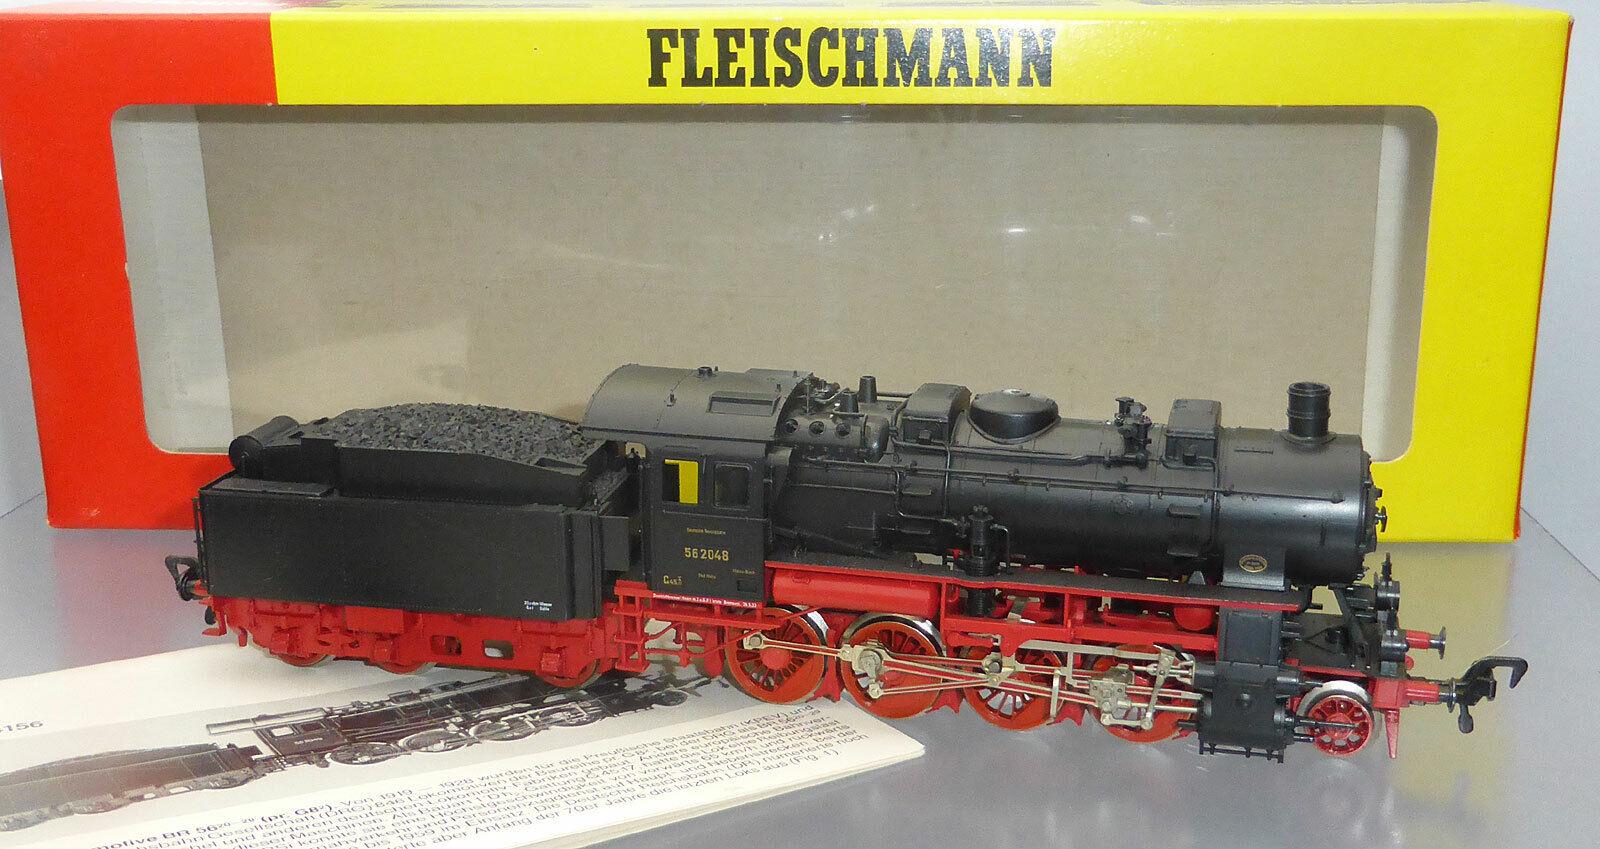 Fleischmann 4156; Locomotora de remolque 56 2048 DRG, sin jugar, en OVP  J854